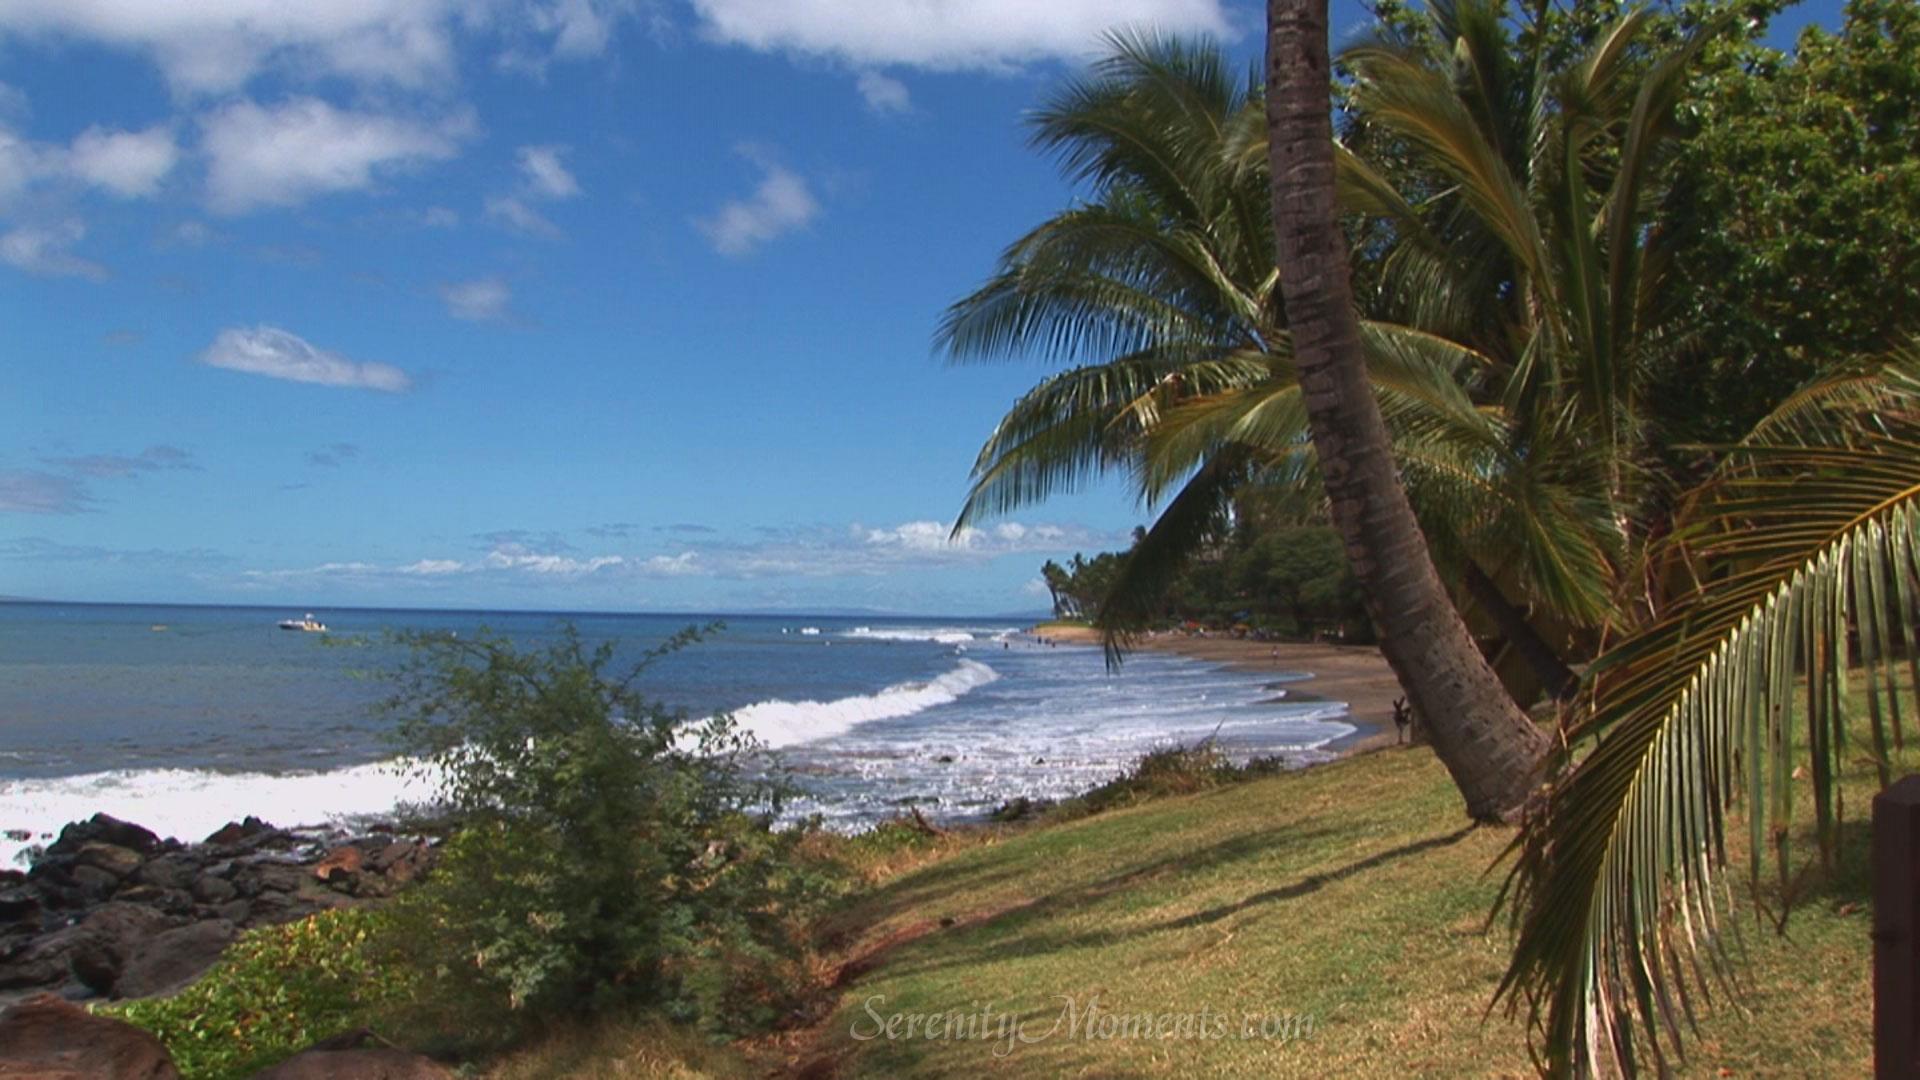 Tropical Island Beach Ambience Sound: Serenity Moments Screensavers, Free Screensavers